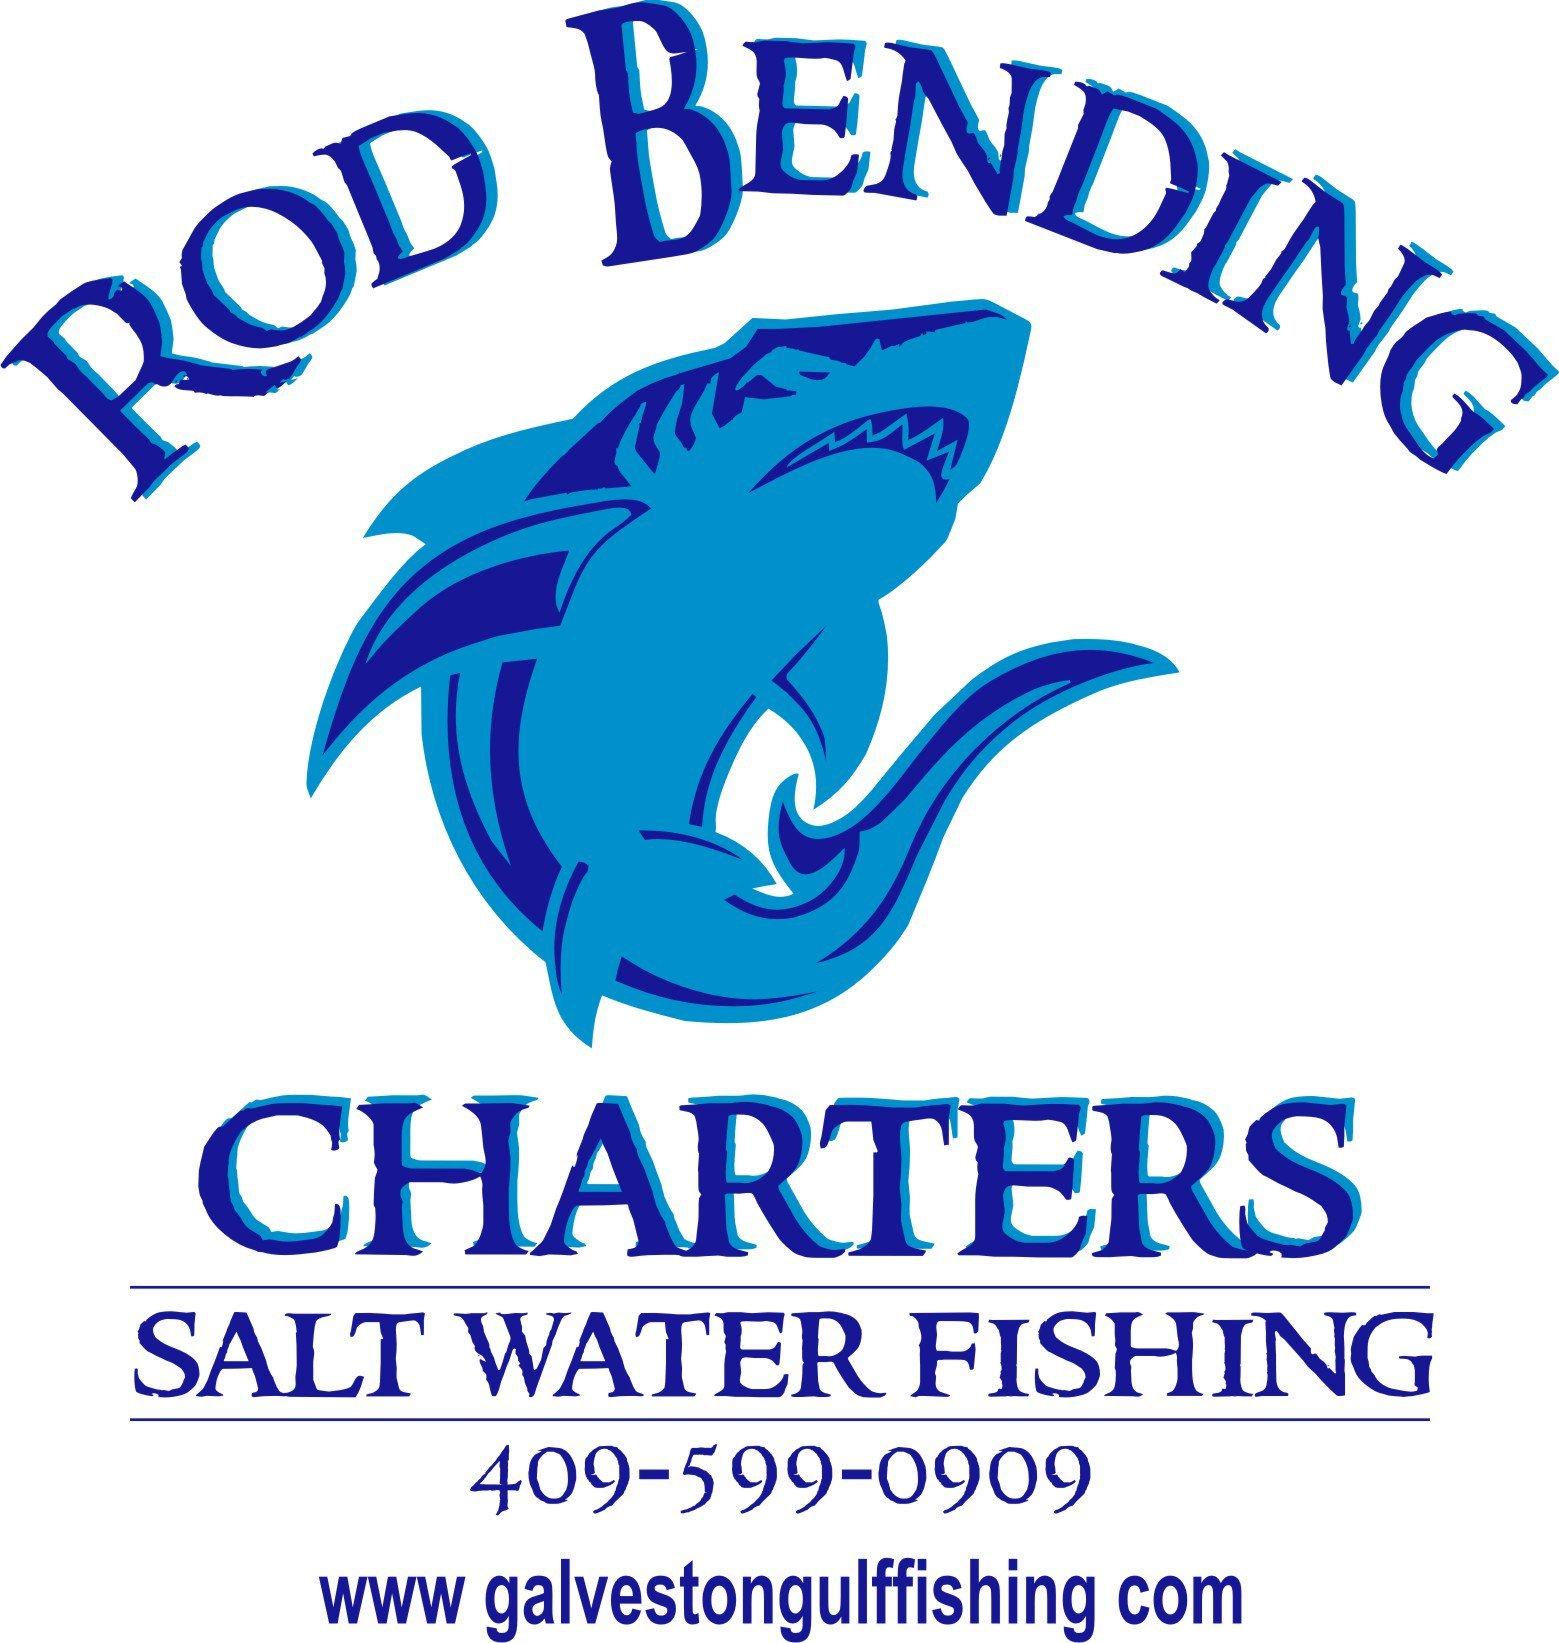 Rod Bending Charters